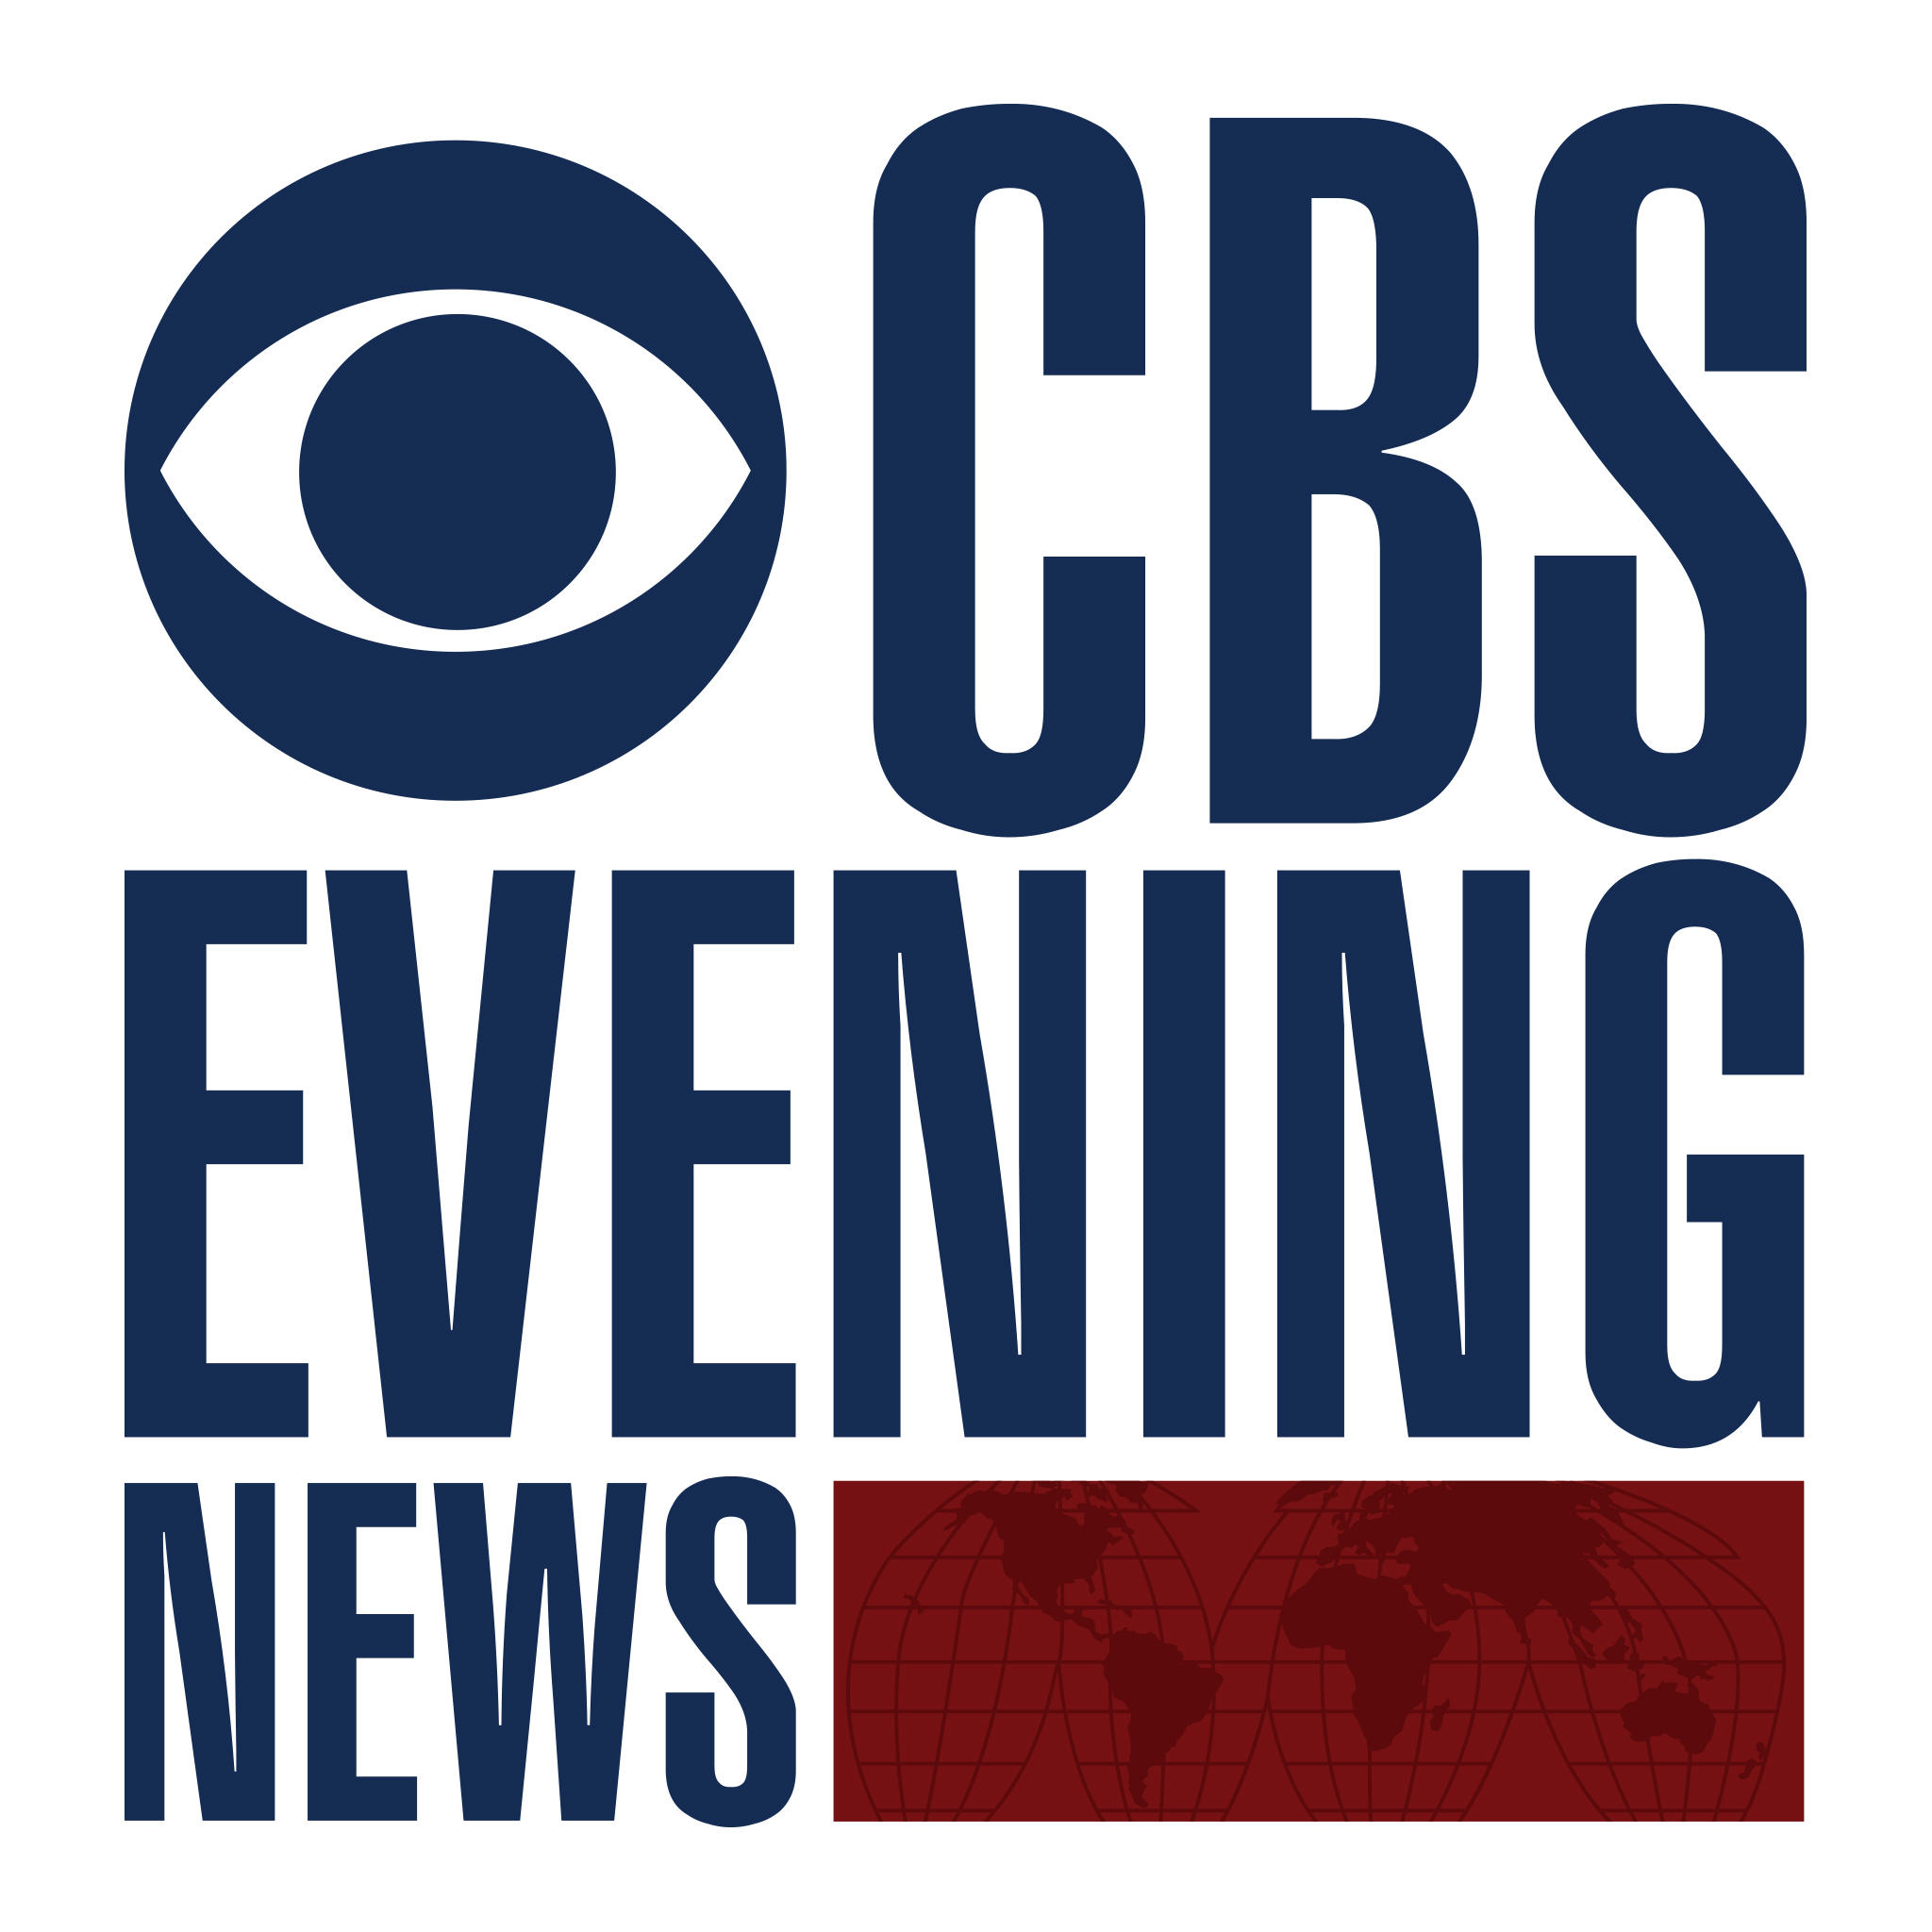 CBS Evening News September 02 2002 Movie HD free download 720p